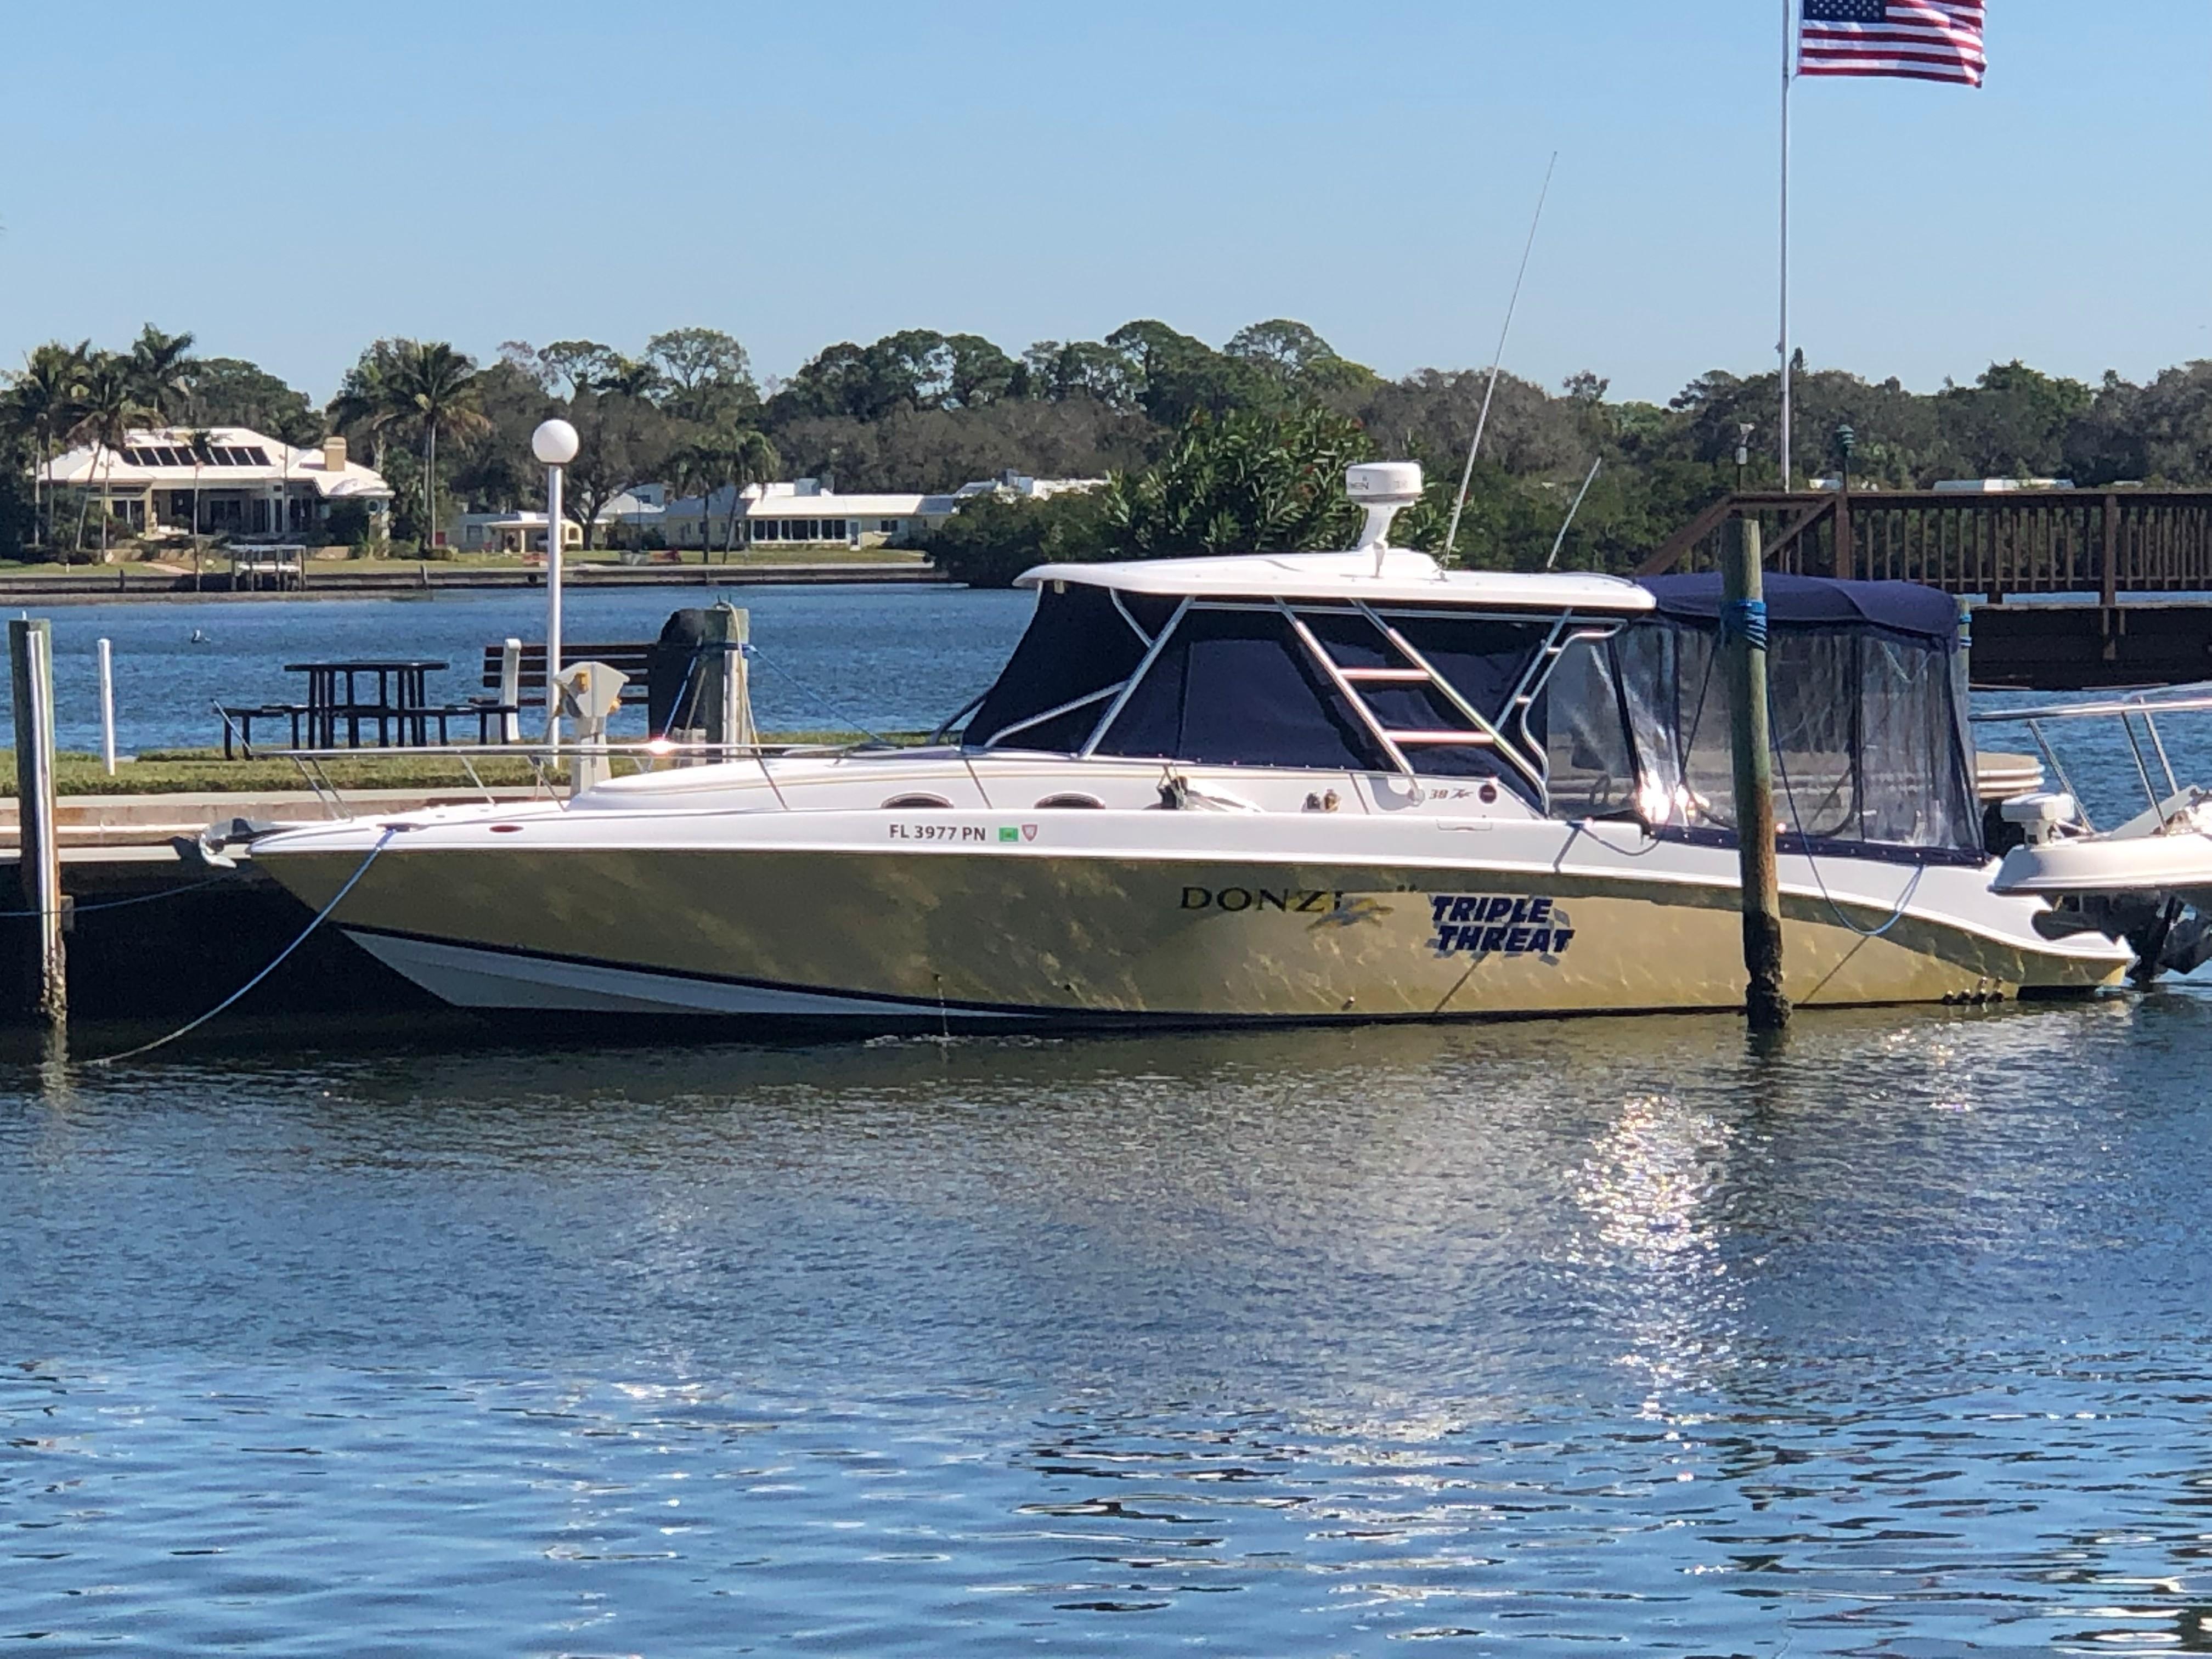 2004 Donzi 38 ZF Cuddy, Sarasota United States - boats com